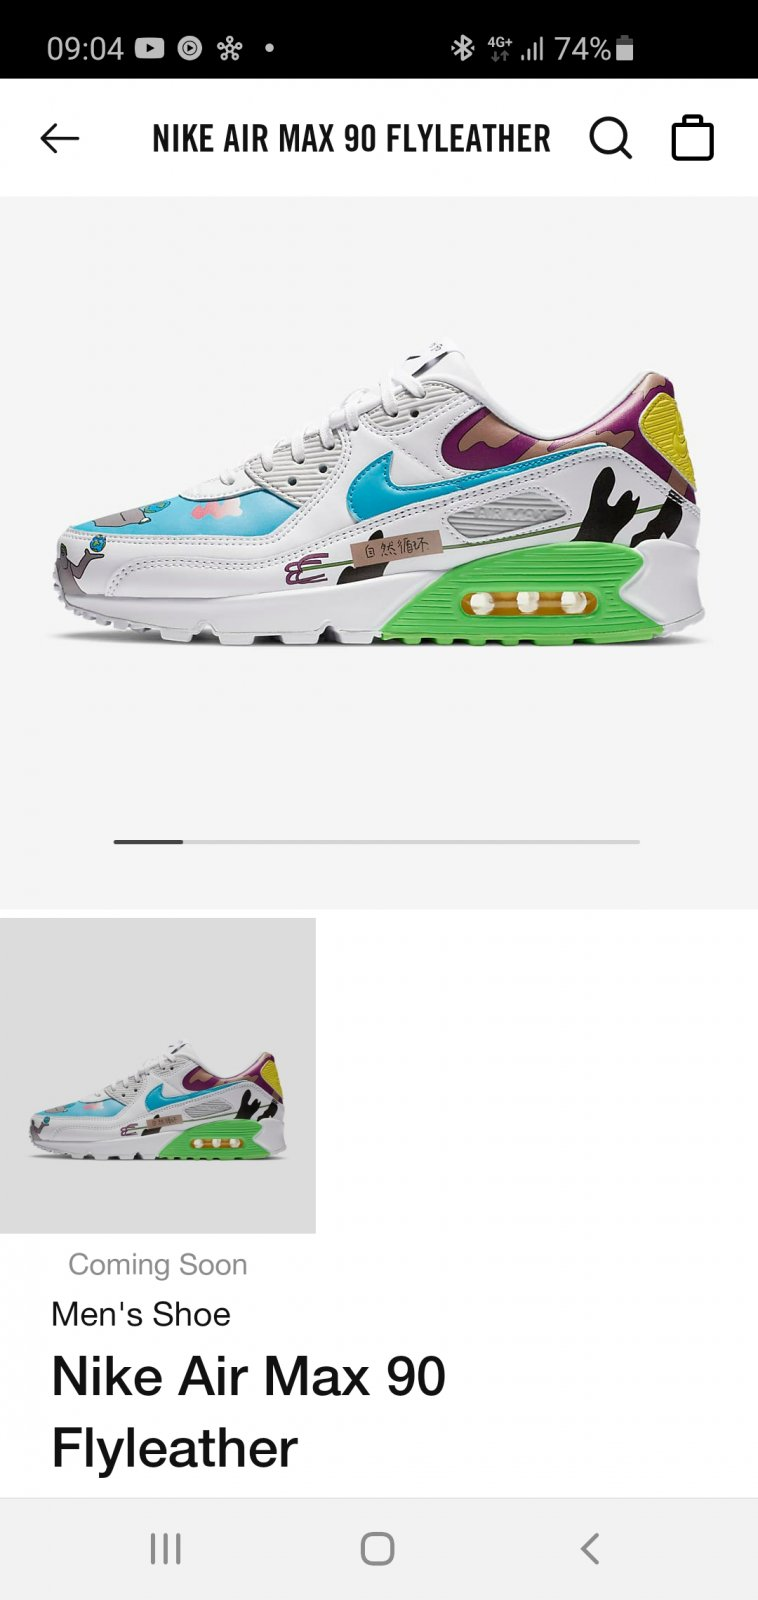 Screenshot_20200917-090459_Nike.jpg